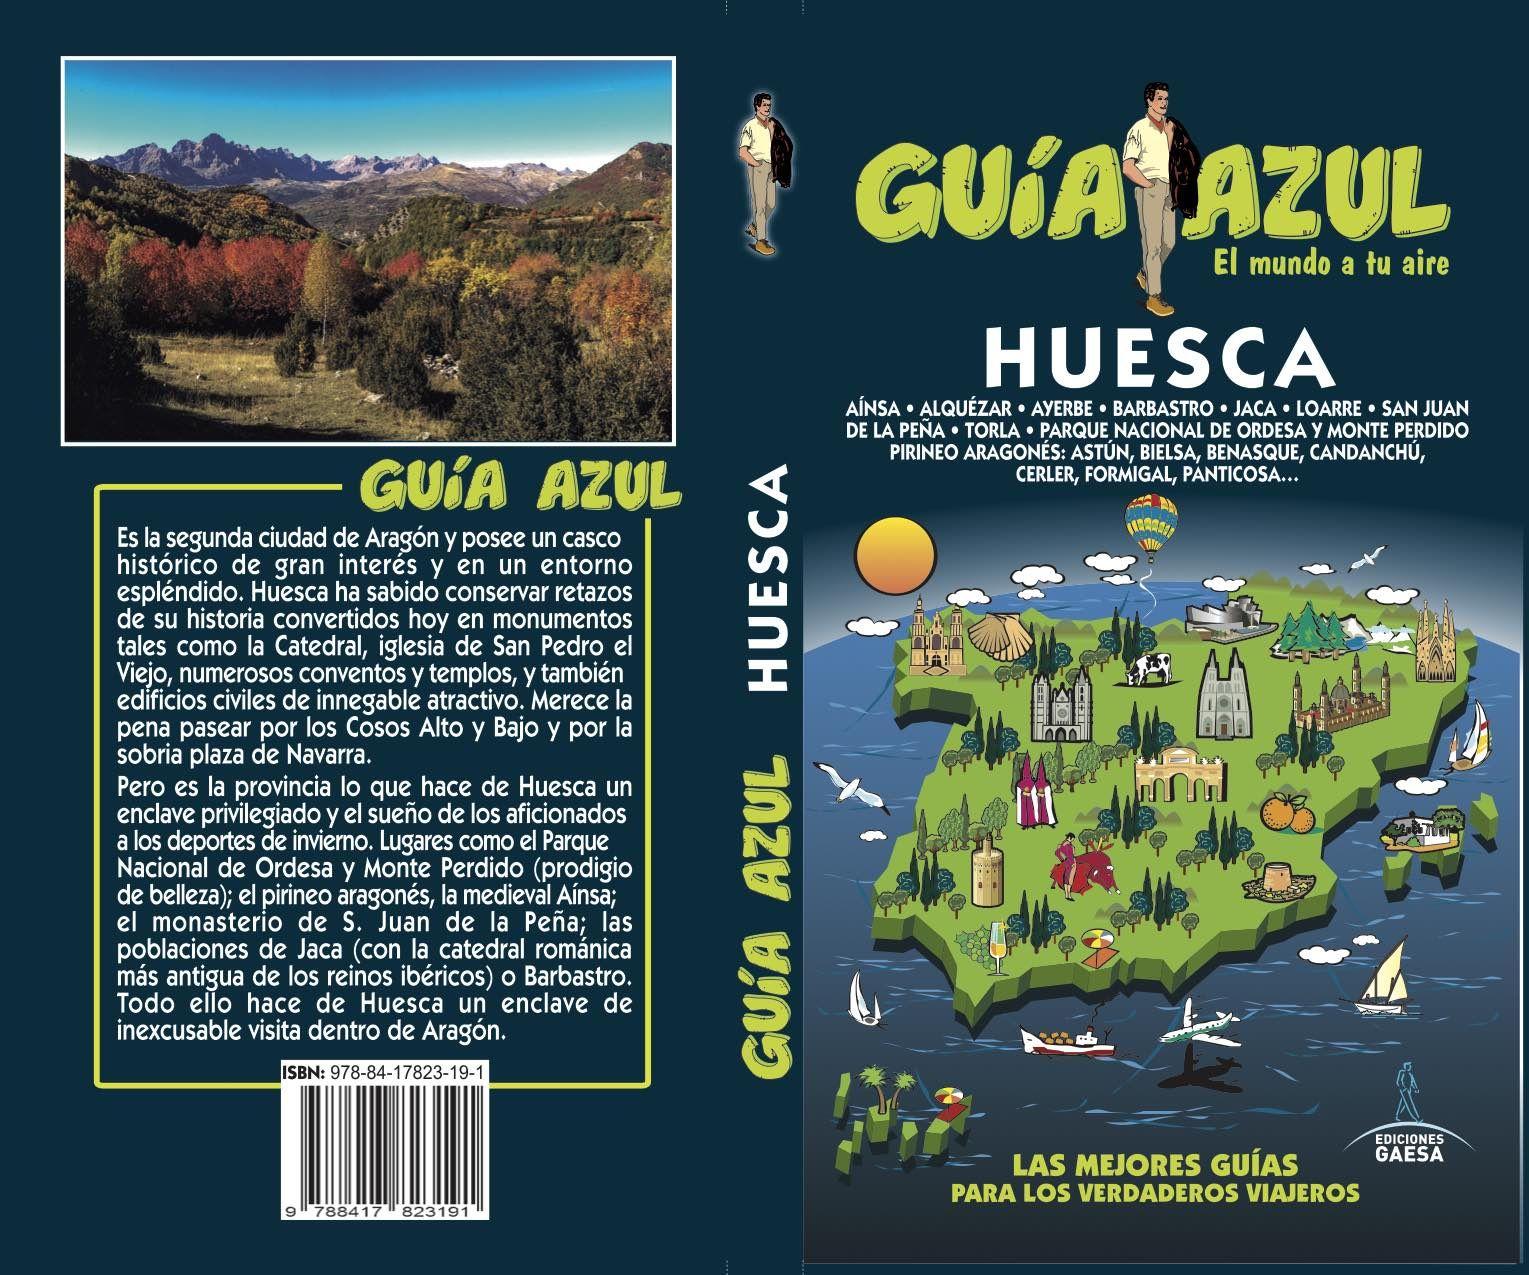 HUESCA GUIA AZUL